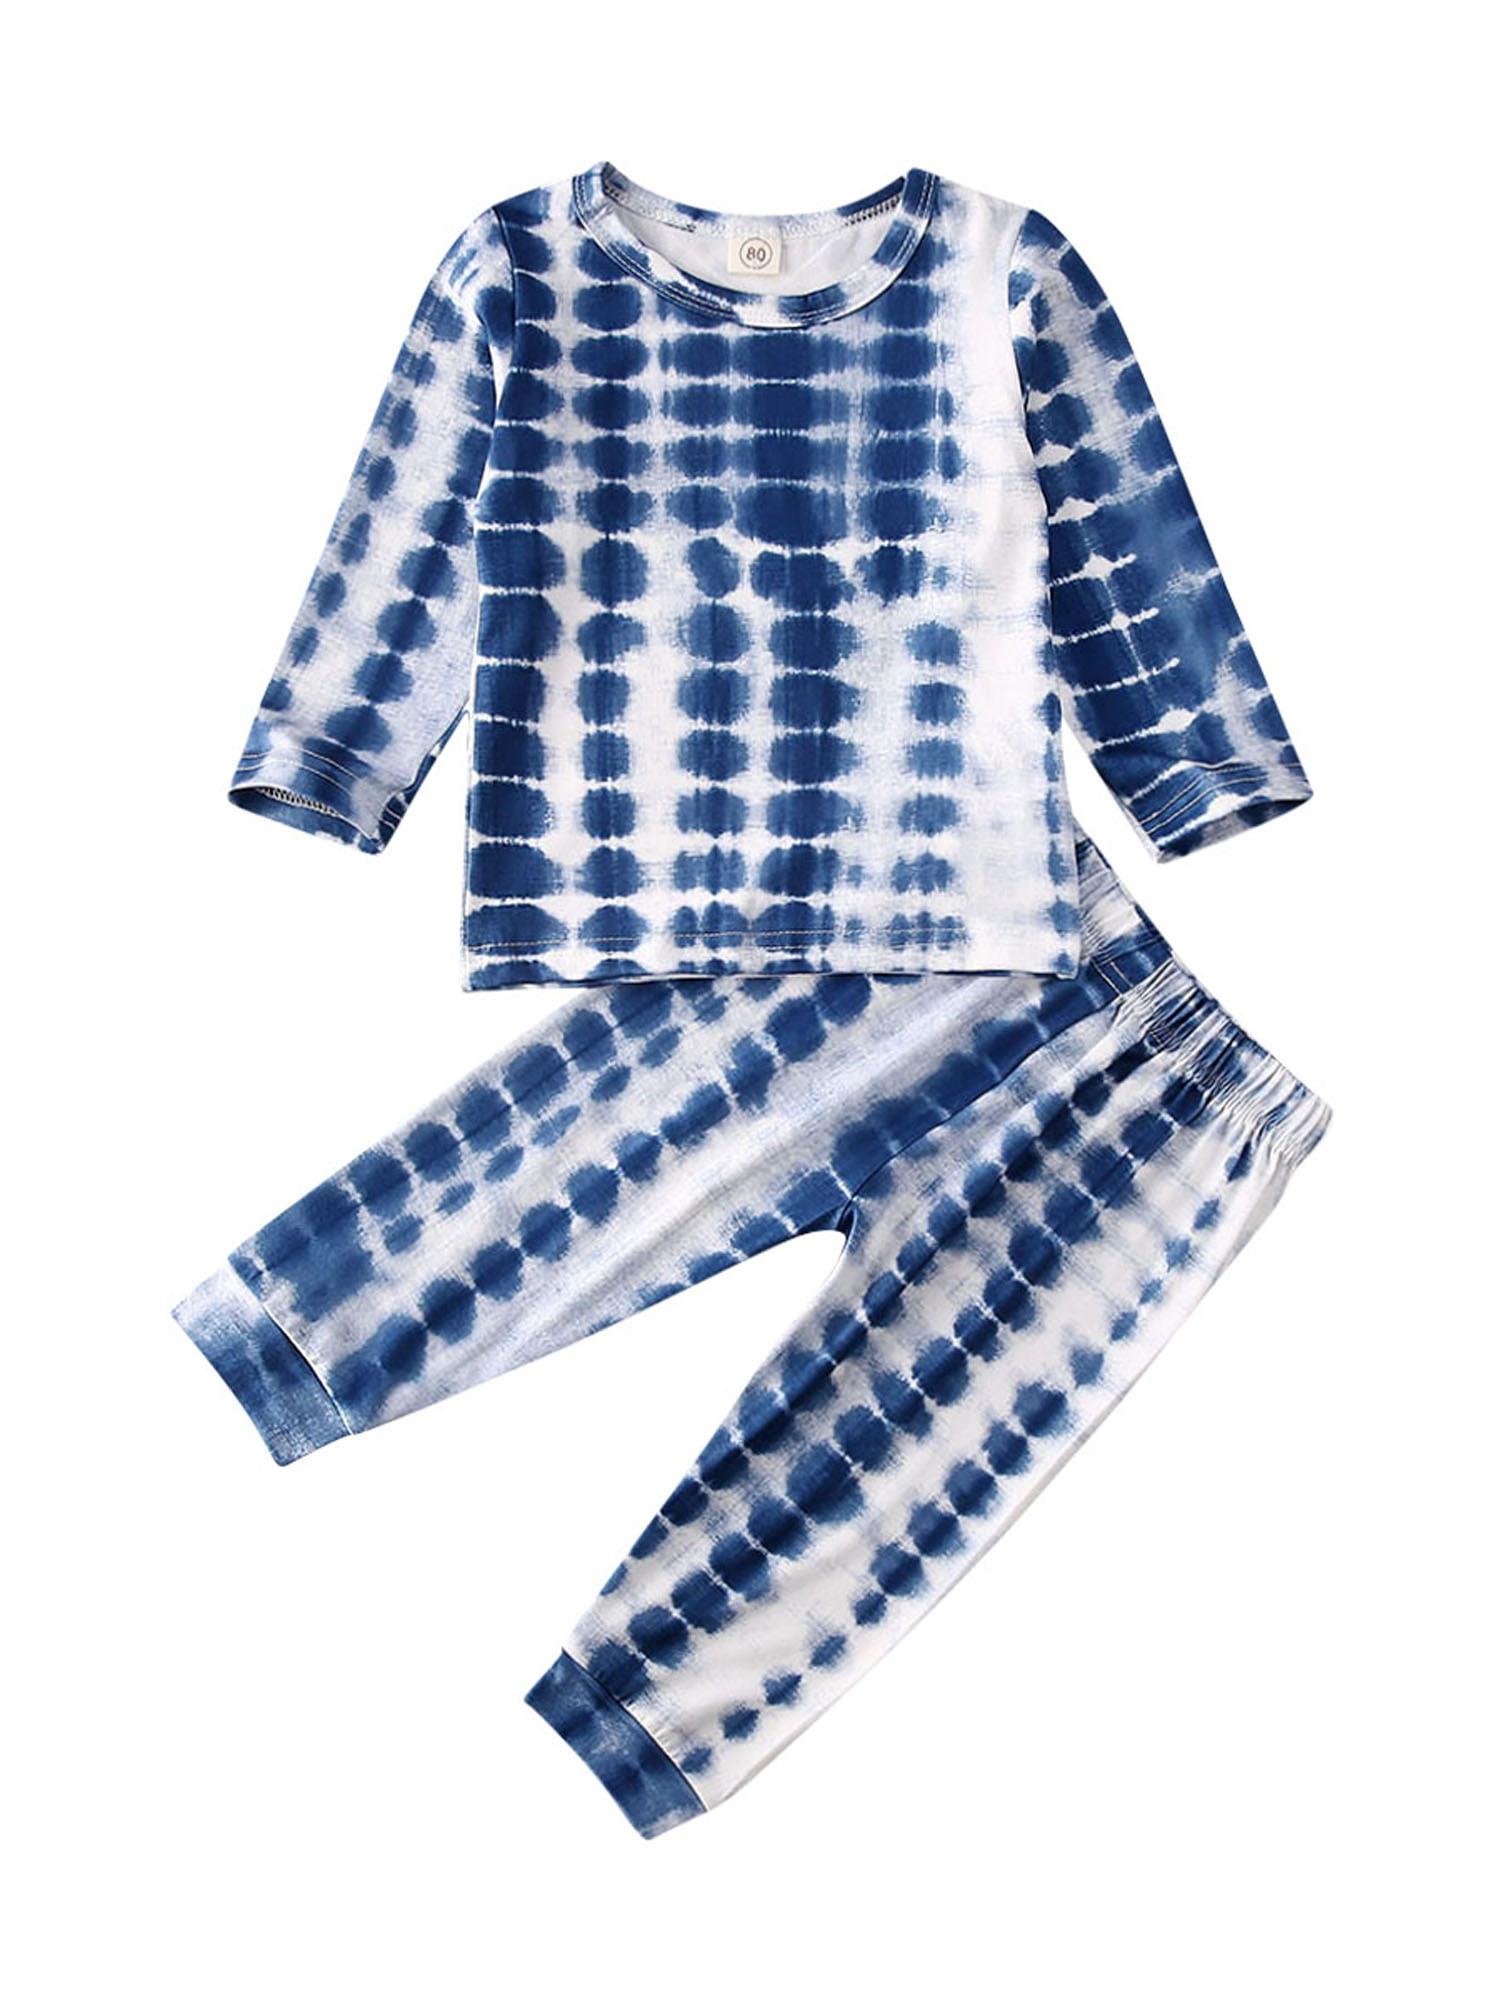 18-24 Months 2-3 3-4 Years In The Night Garden Boys Pyjama Set Age12-18